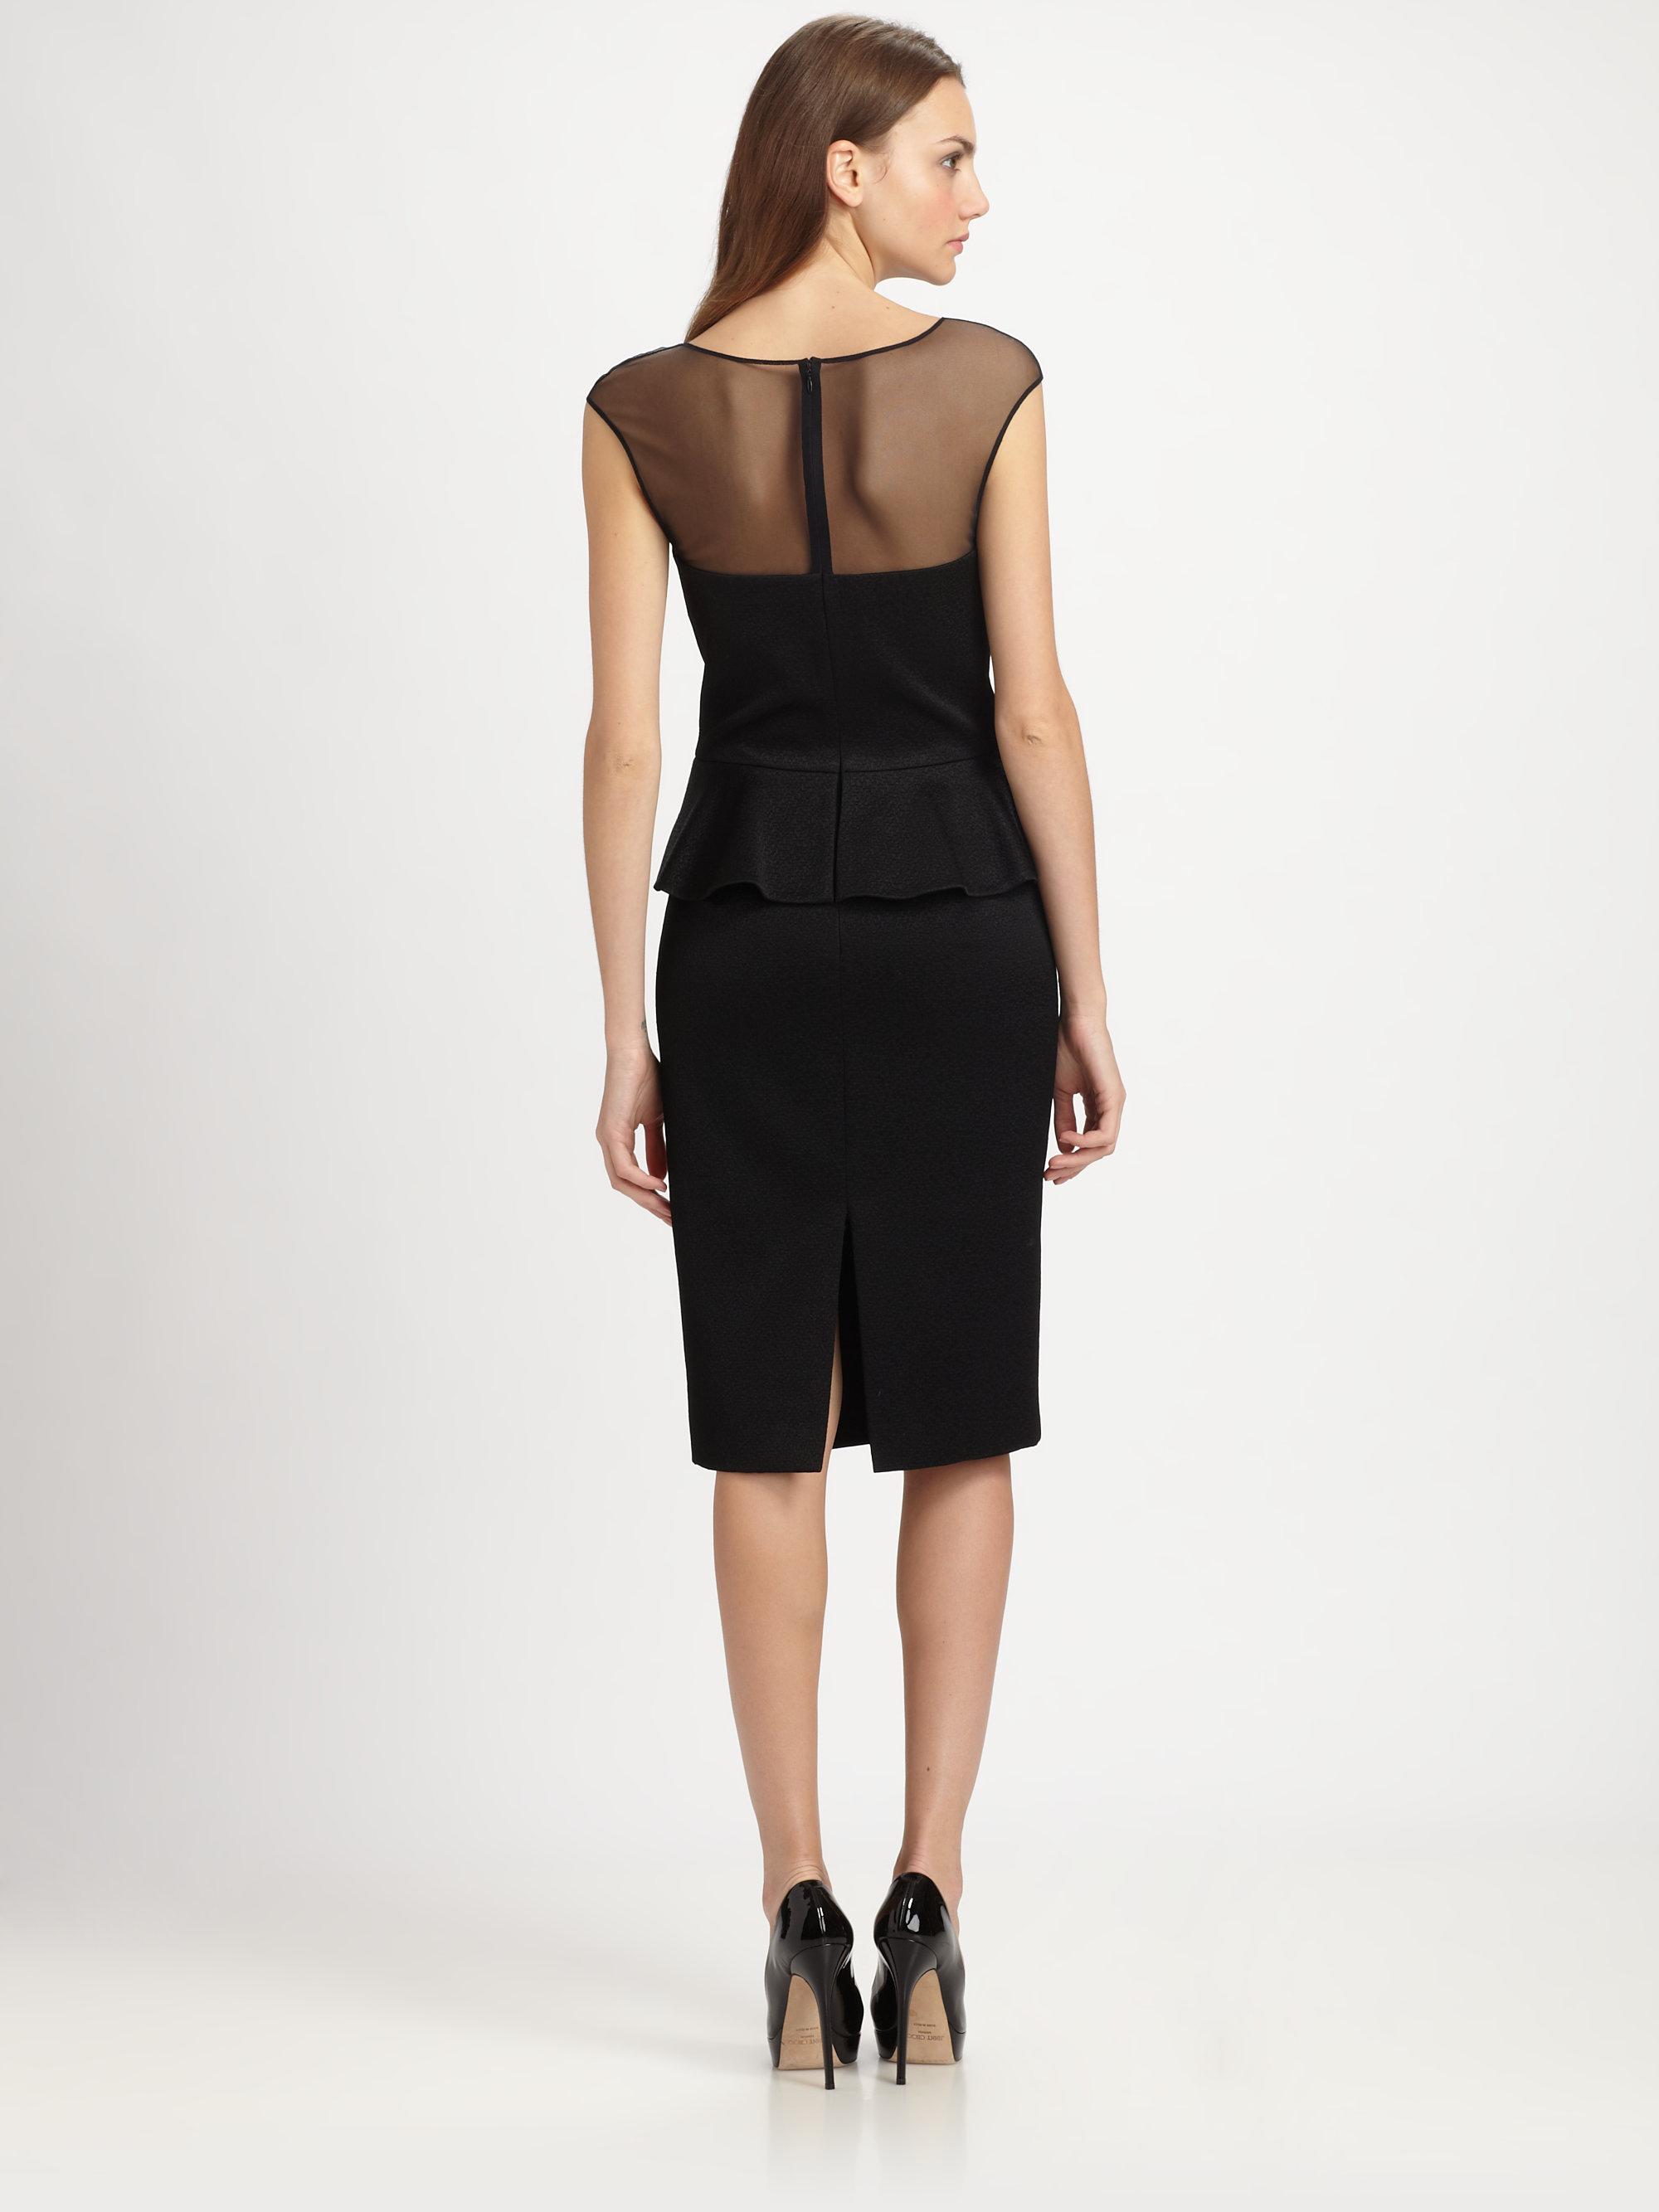 Black Peplum Cocktail Party Dress - fEROSh